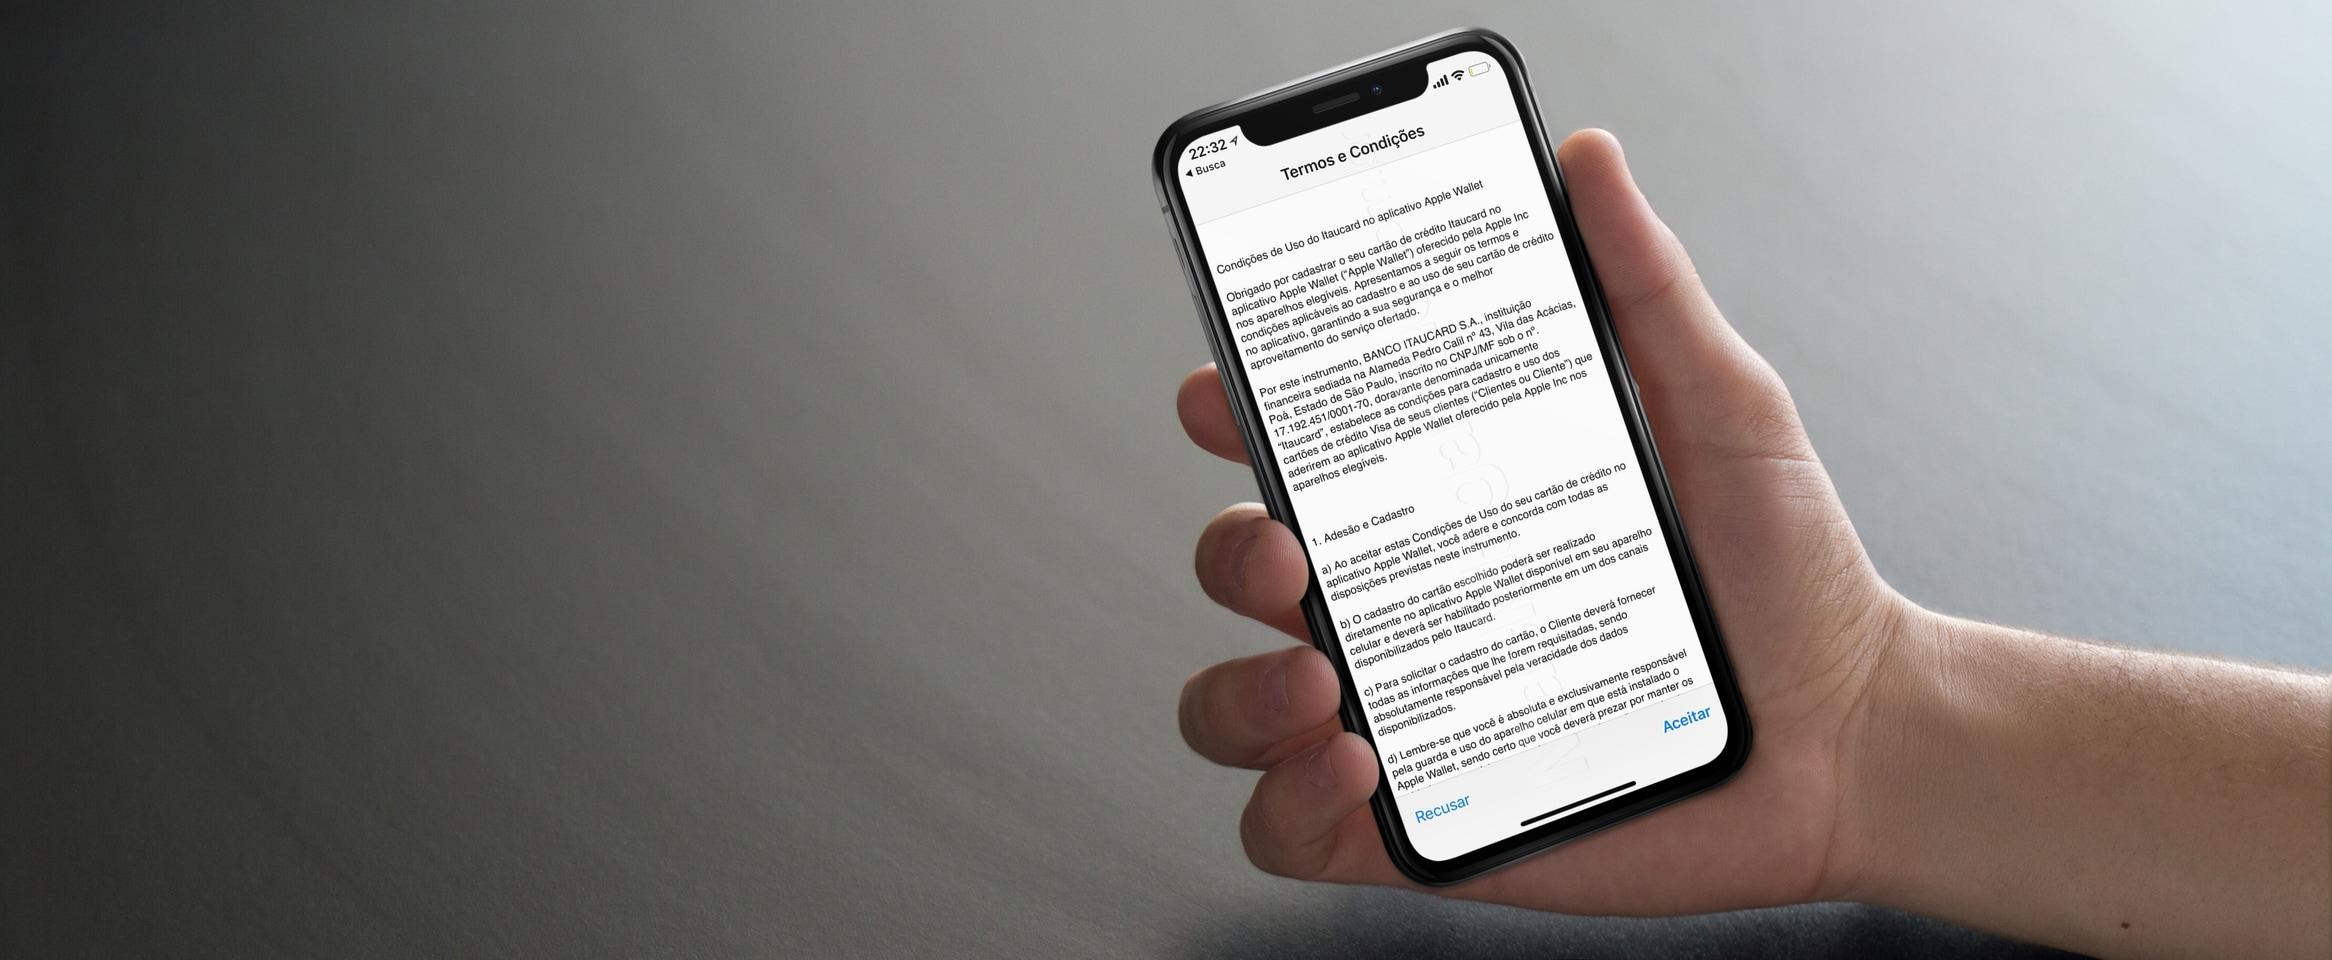 Termos do Itaú/Apple Pay Brasil